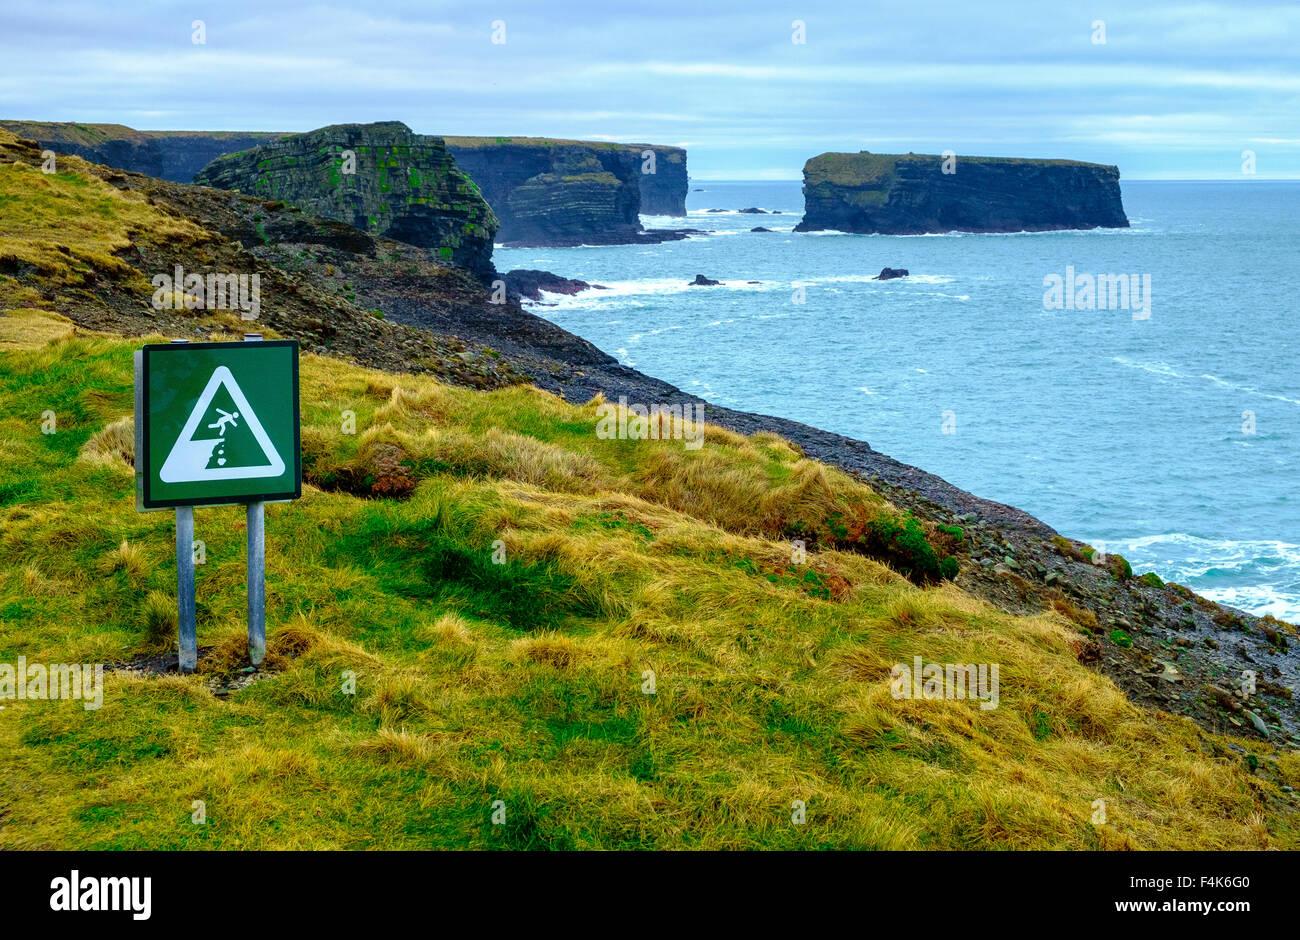 warning sign danger rocks waves no swimming coast - Stock Image